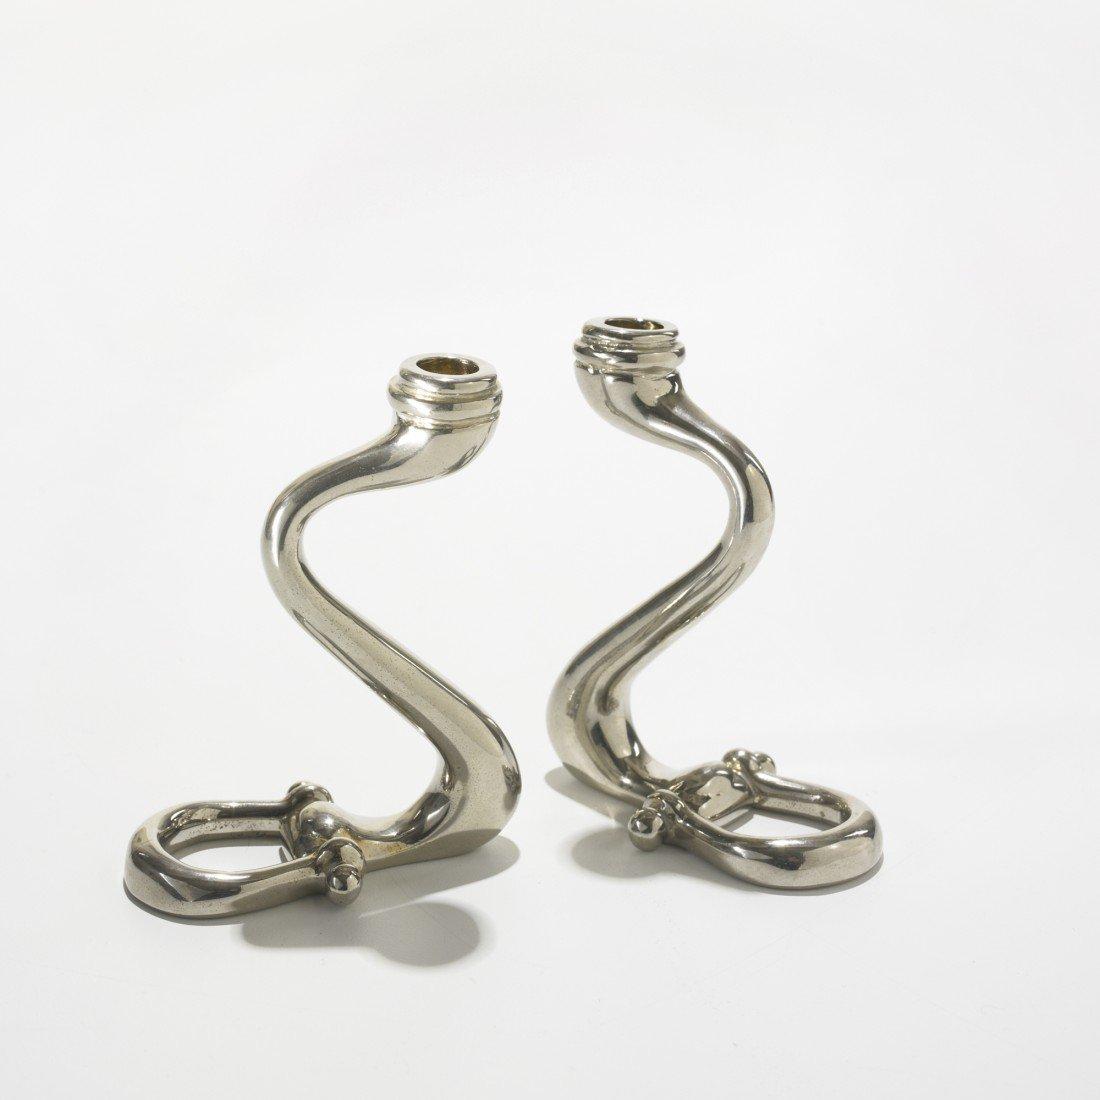 243: Gucci candlesticks, pair